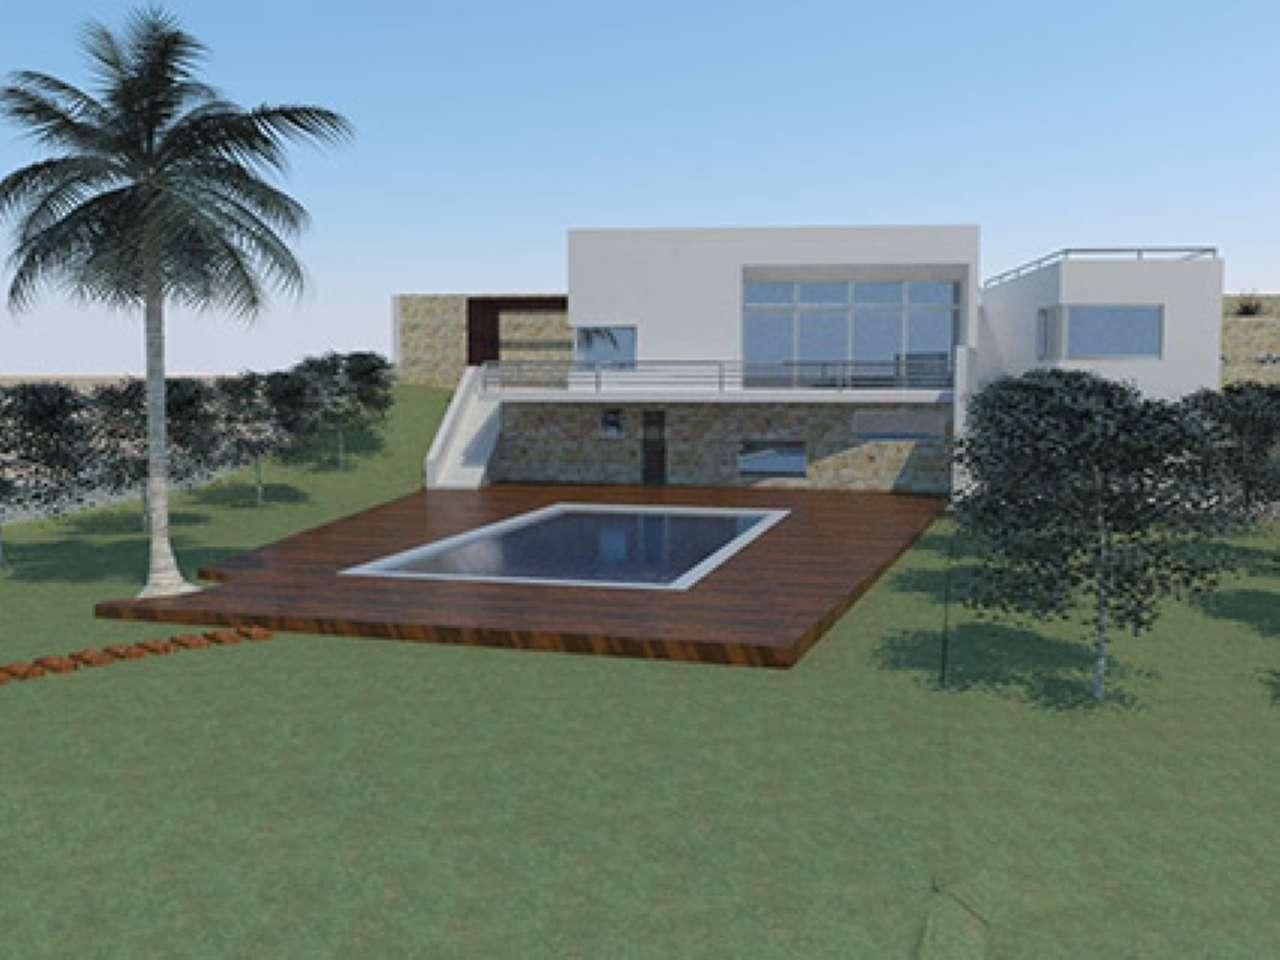 Vendita Villa Roma, isola Largo Olgiata 15, con giardino ...